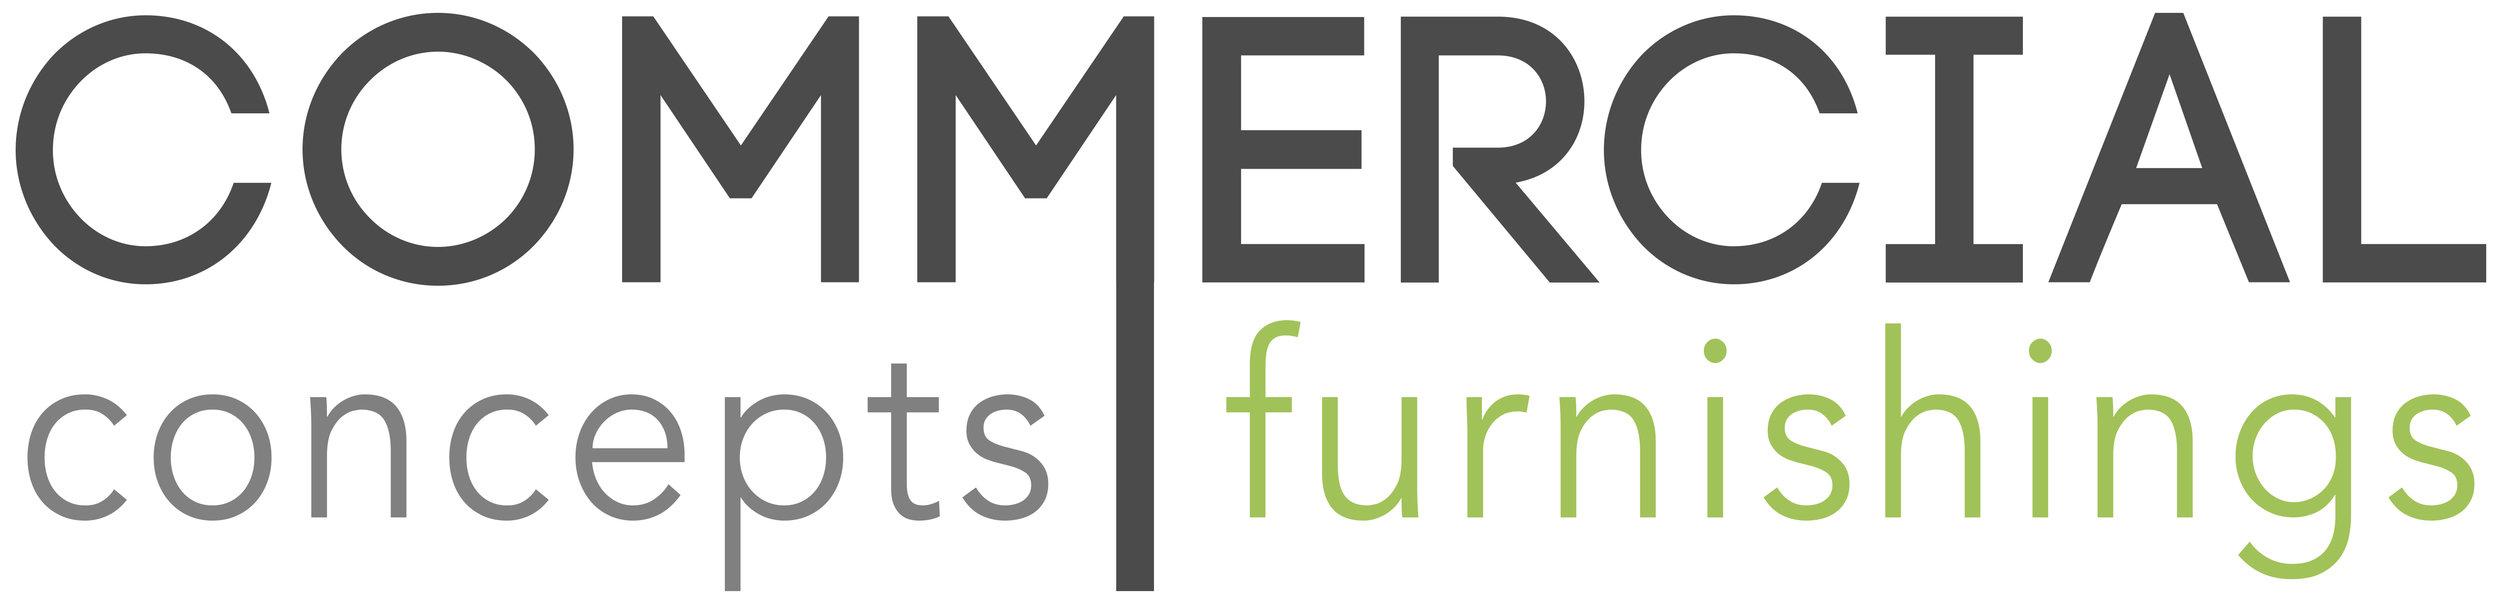 WEC- Logo- CCF Commerical Concepts & Furnishings.jpg